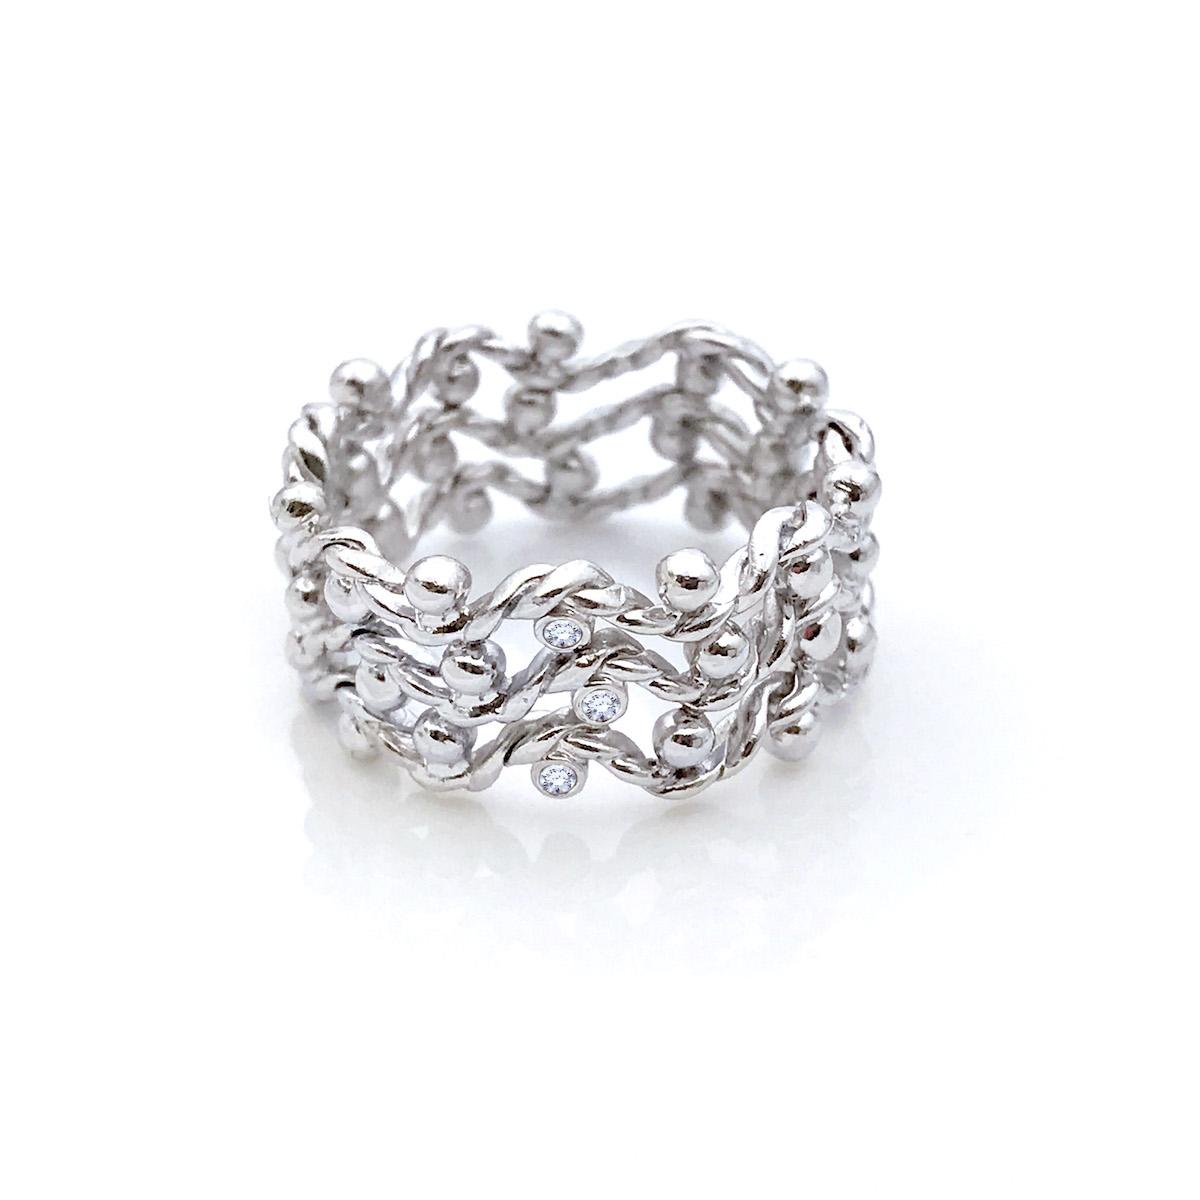 triple-twist-wave-chevon-open-lace-wide-band-jewelyrie_0683W